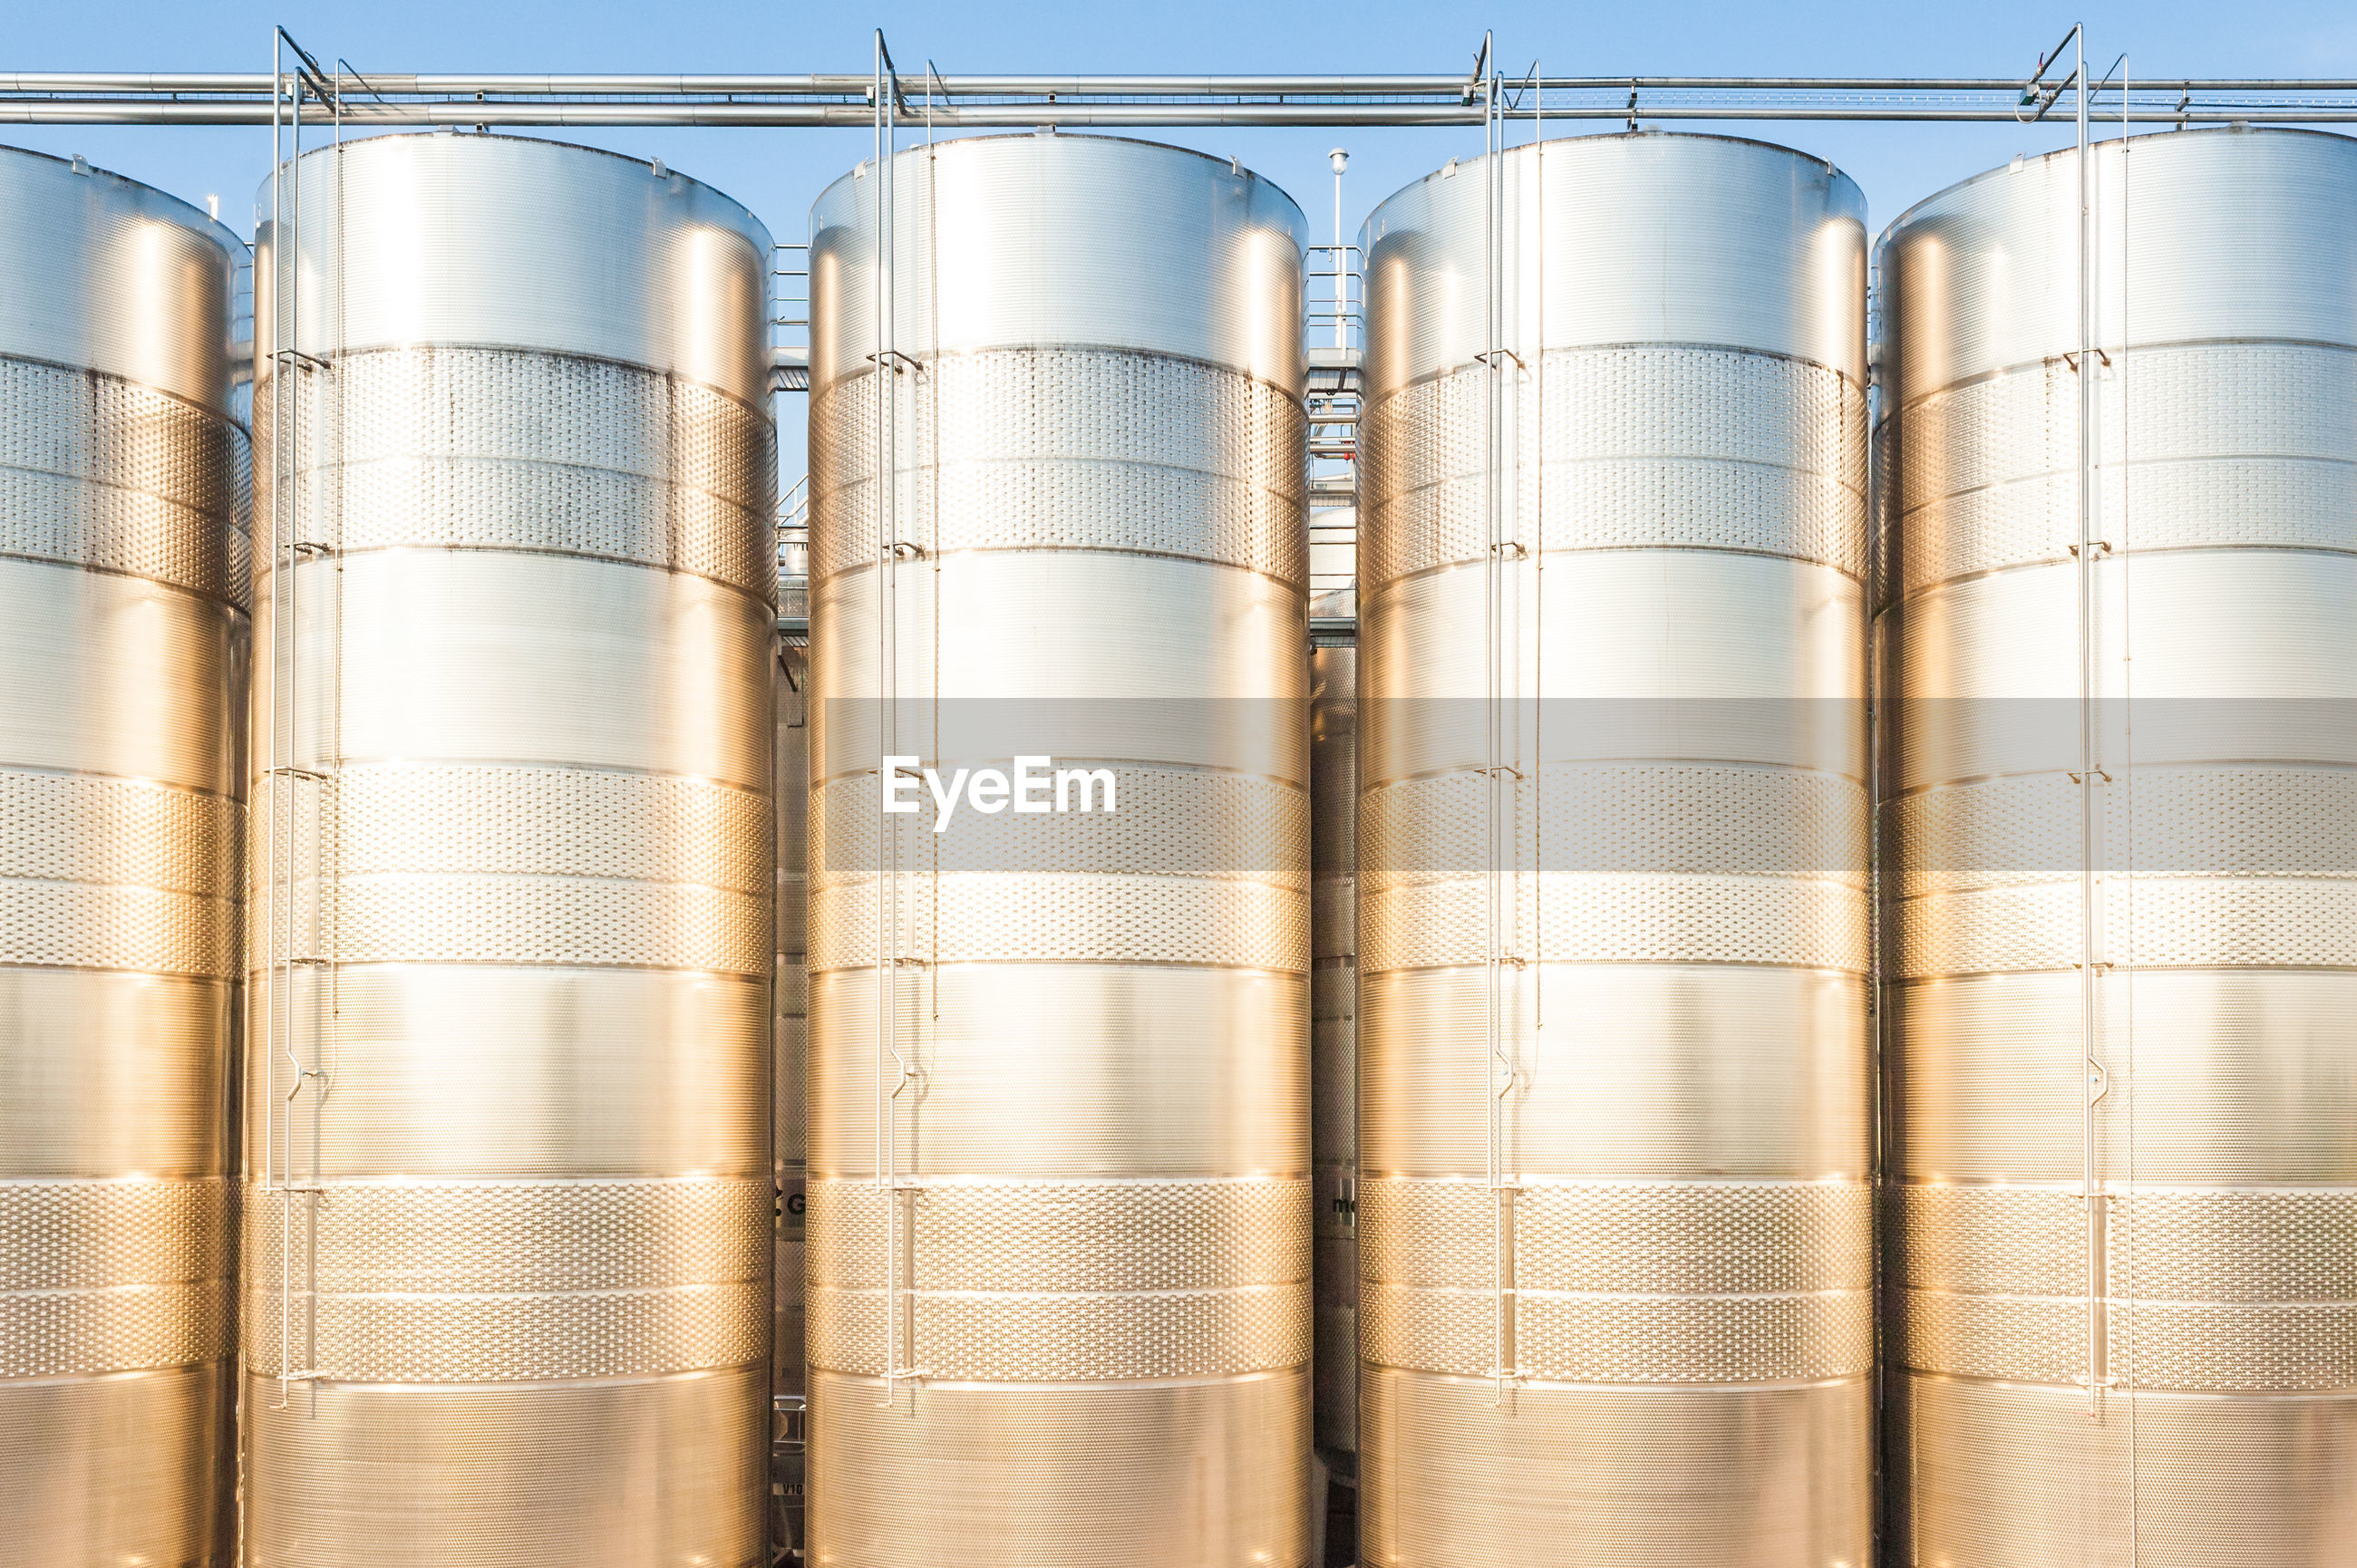 Full frame shot of storage tanks